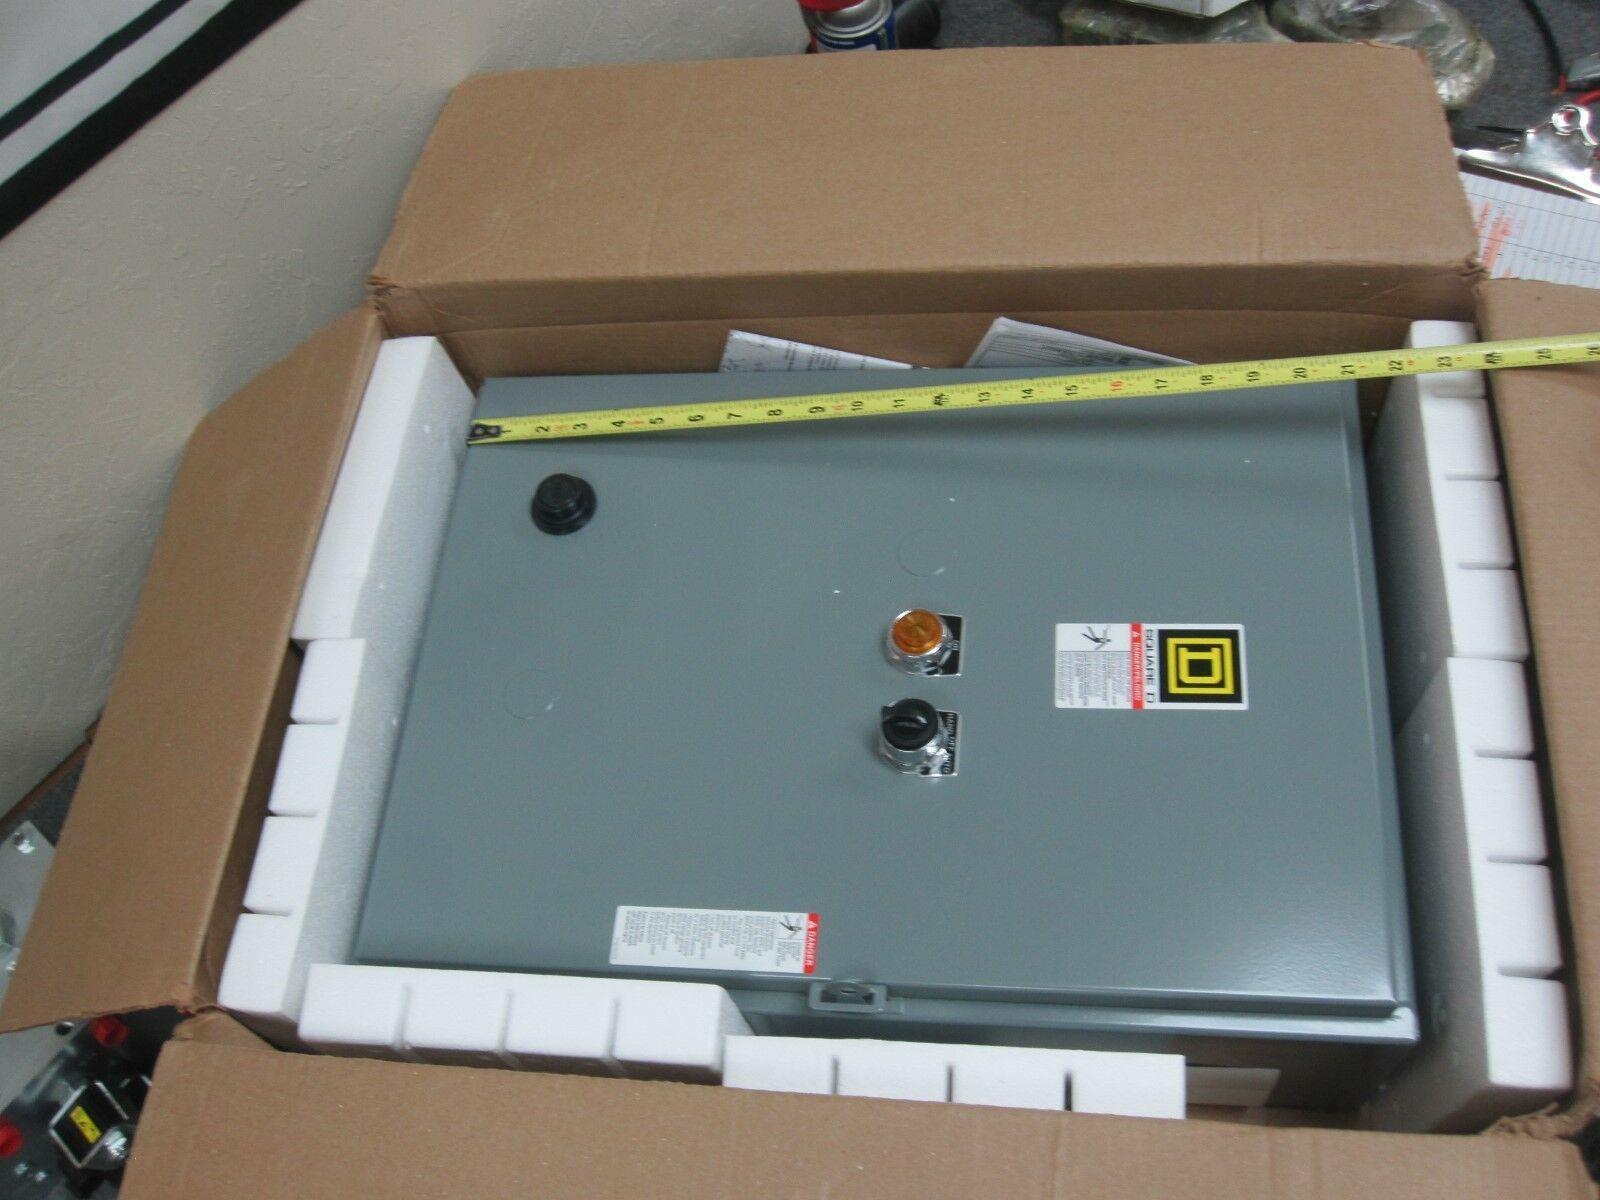 Square D AC Magnetic Starter 8536SBG1V02CE3210F4G105G5610P68X11Y217 New